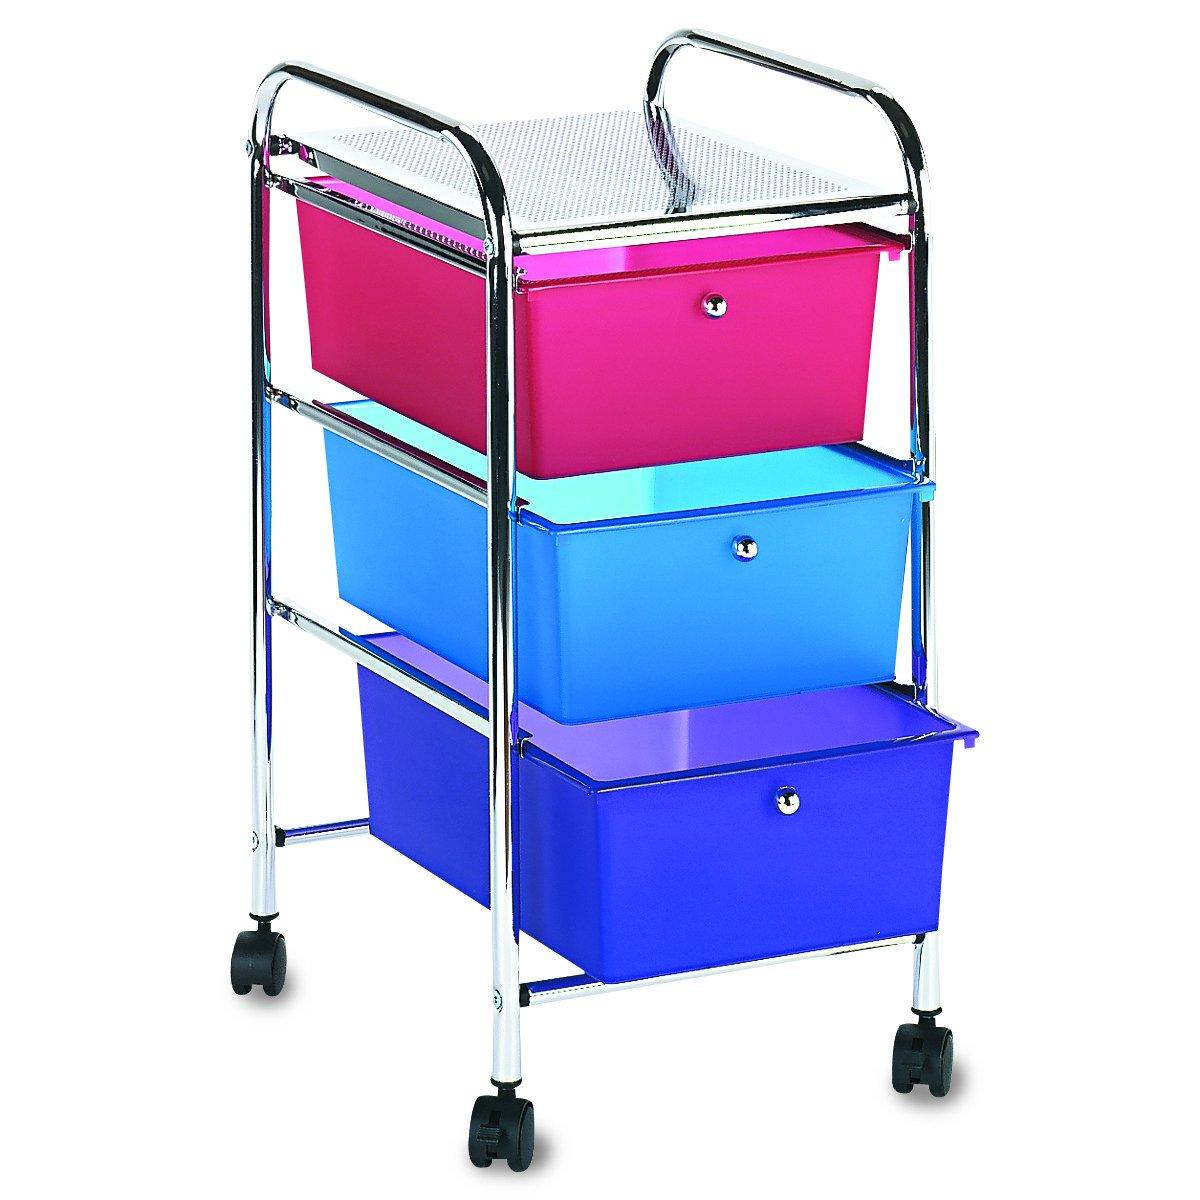 Advantus Cropper Hopper Home Center Rolling Cart, 3 Drawer Multi Vertiflex Products 34081